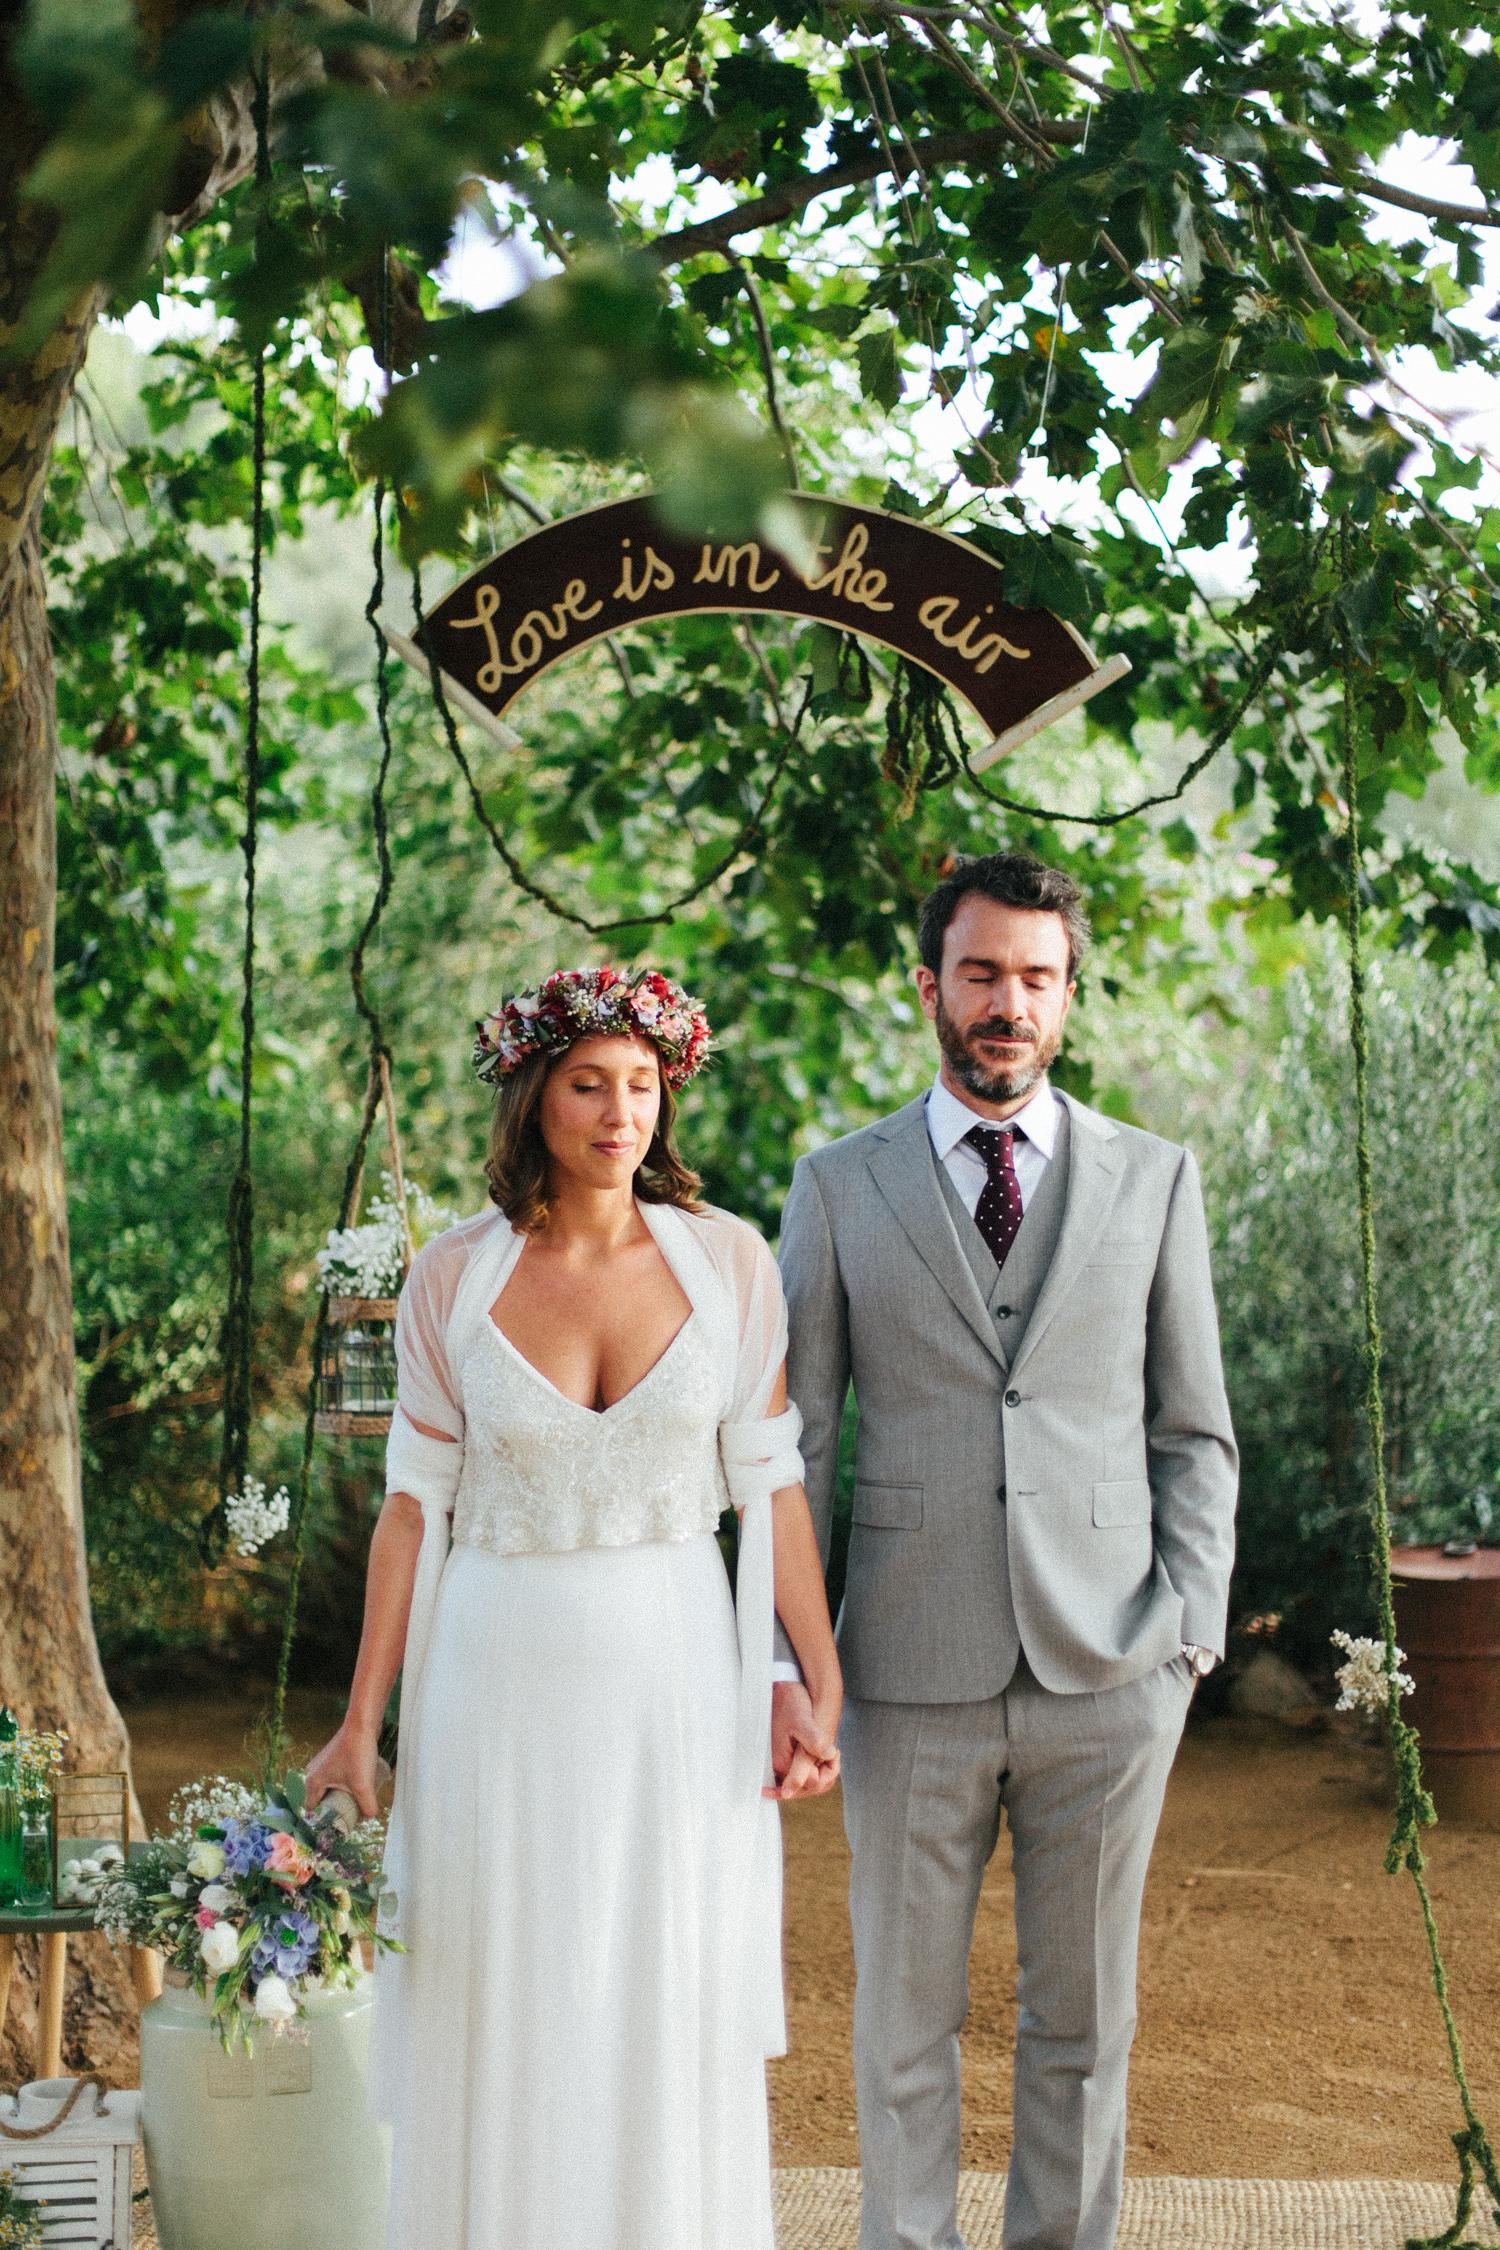 Boda barcelona wedding riudecols165.jpg